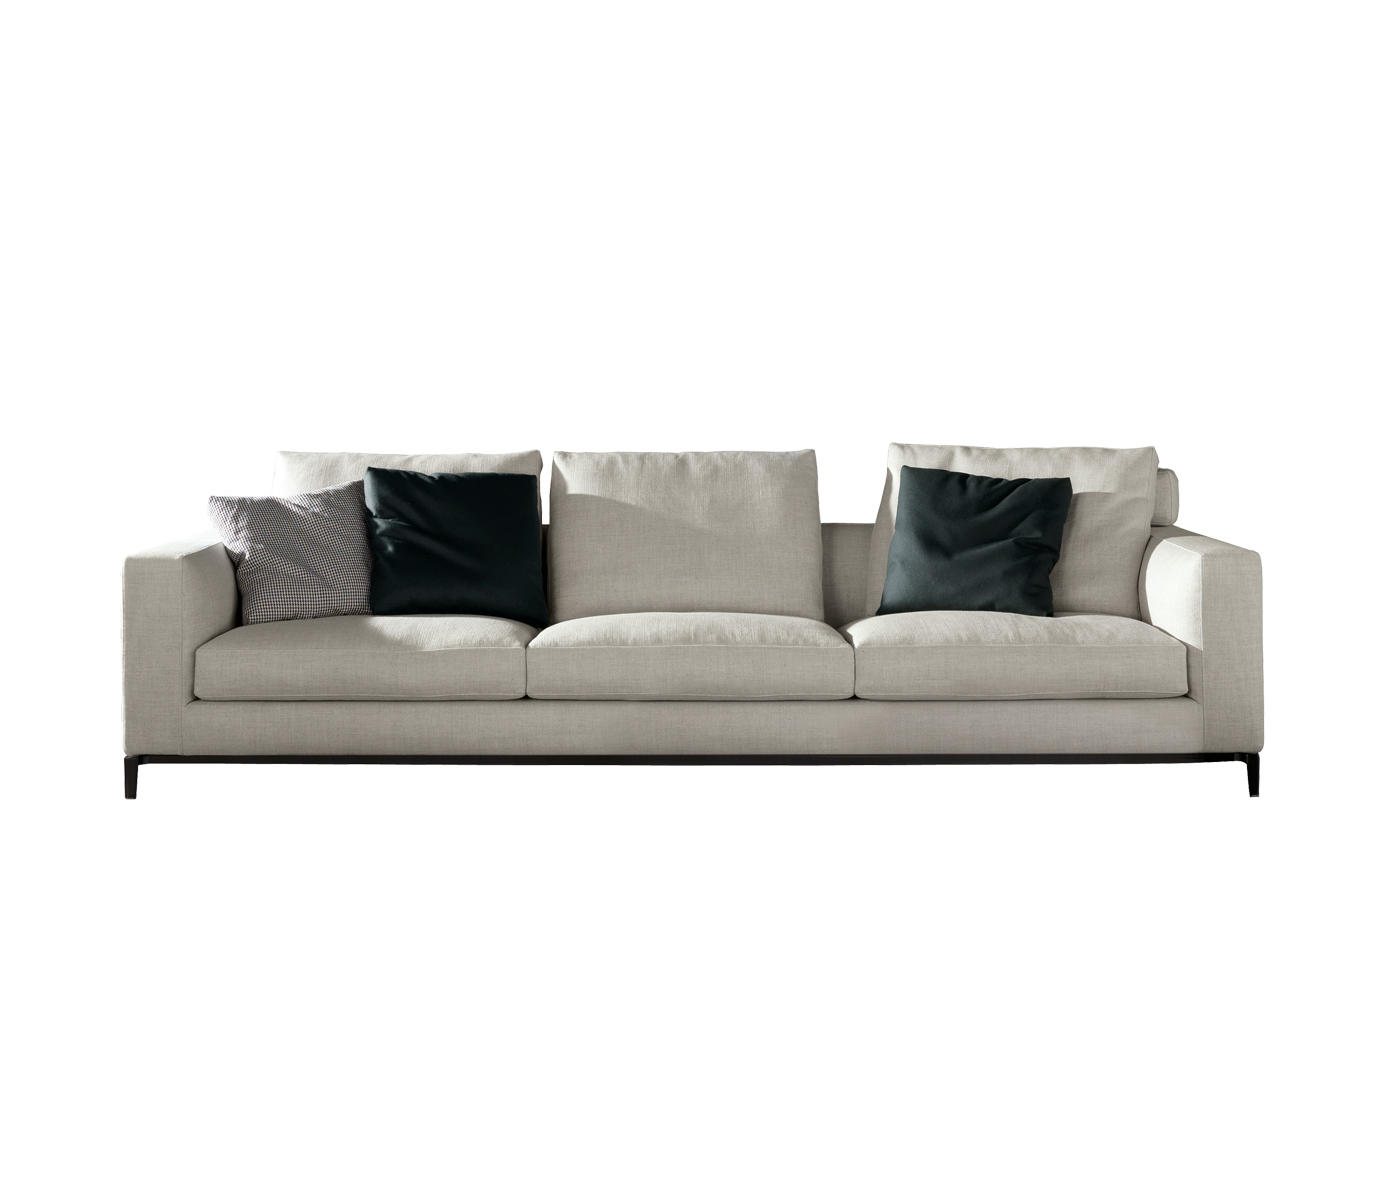 ANDERSEN - Sofas from Minotti | Architonic